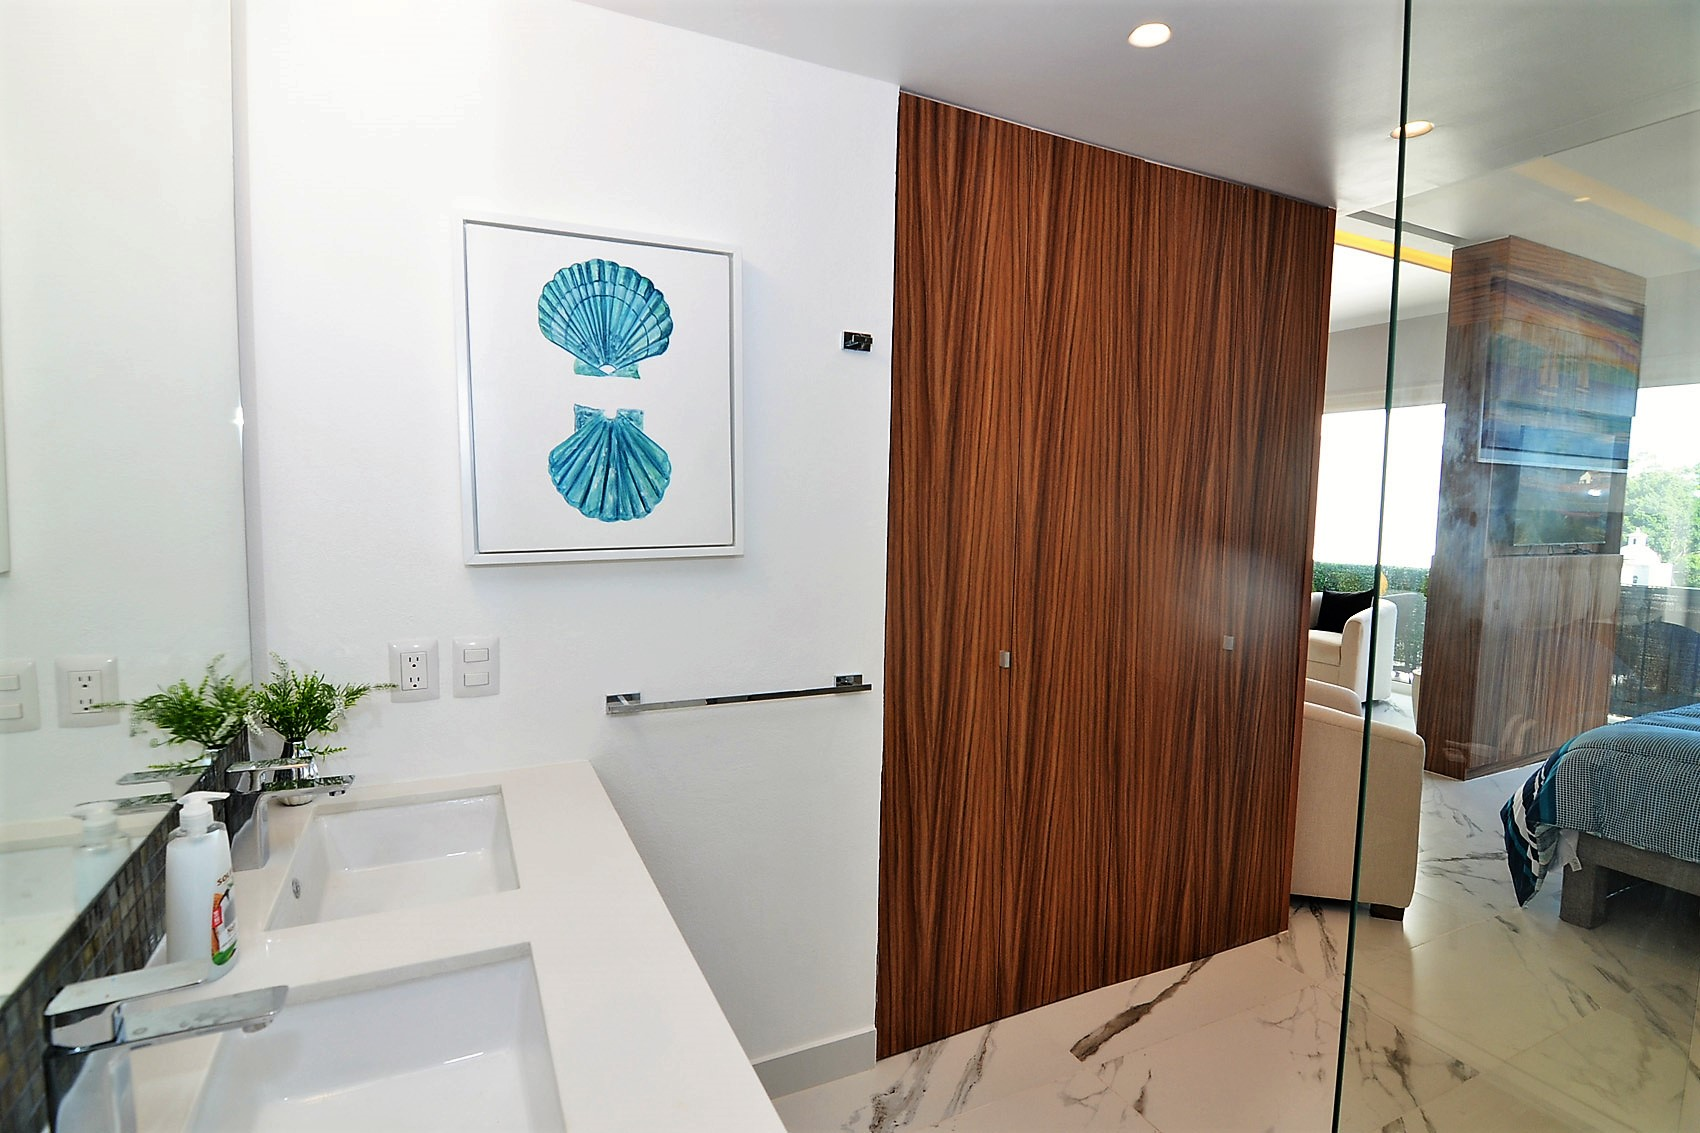 Condo Avida Super Studio 4 - Puerto Vallarta Furnished Condo Romantic Zone (25)